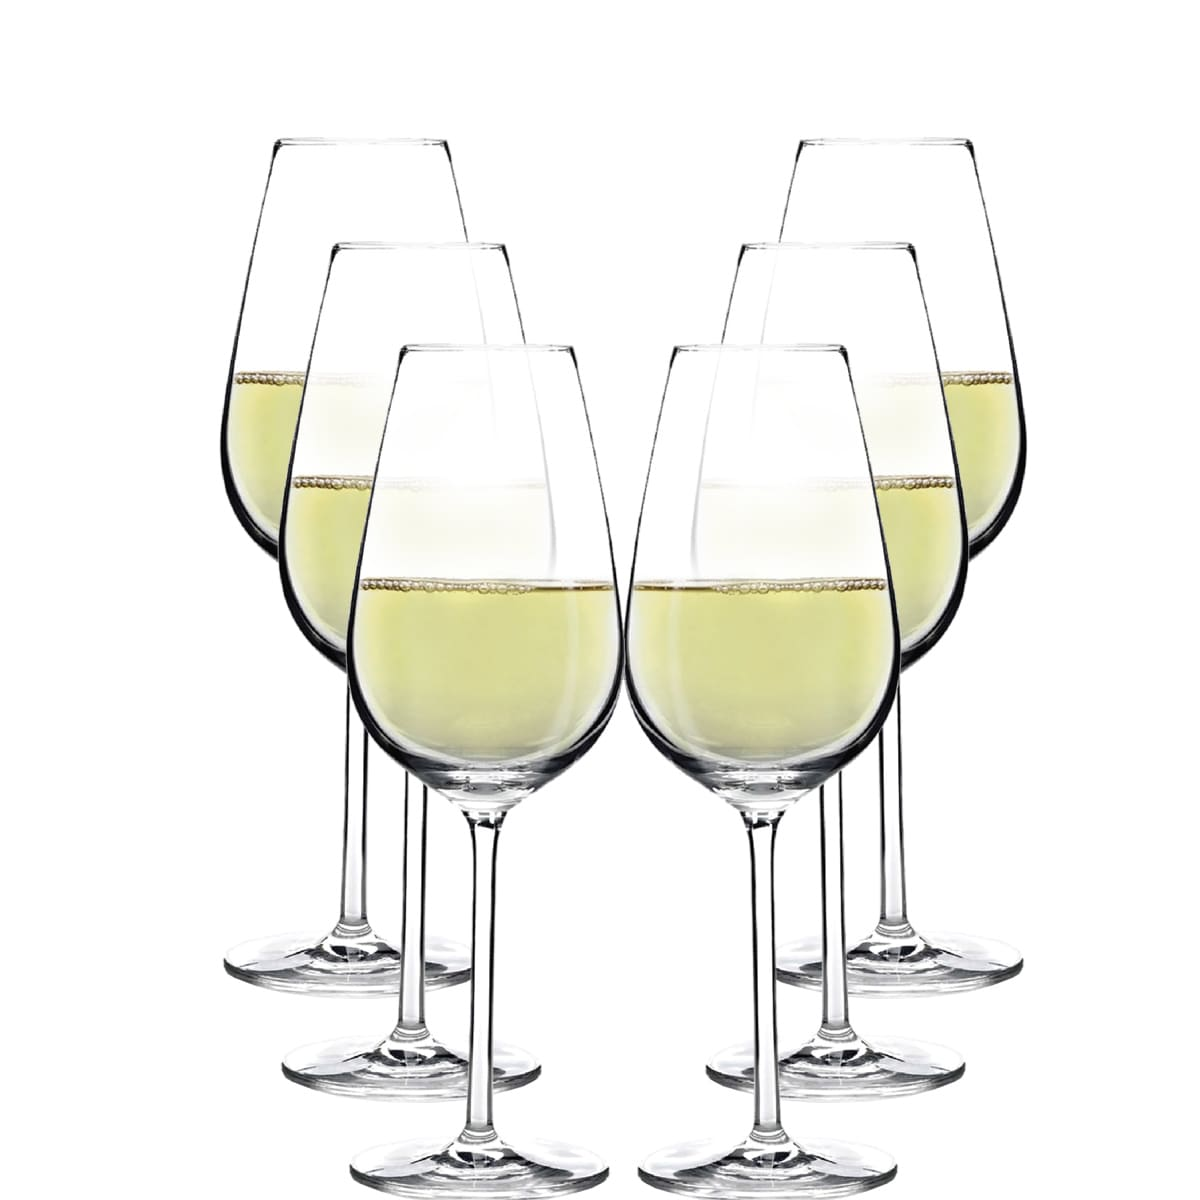 Taça de Vinho Branco Aspergo de Cristal 370ml 6 Pcs